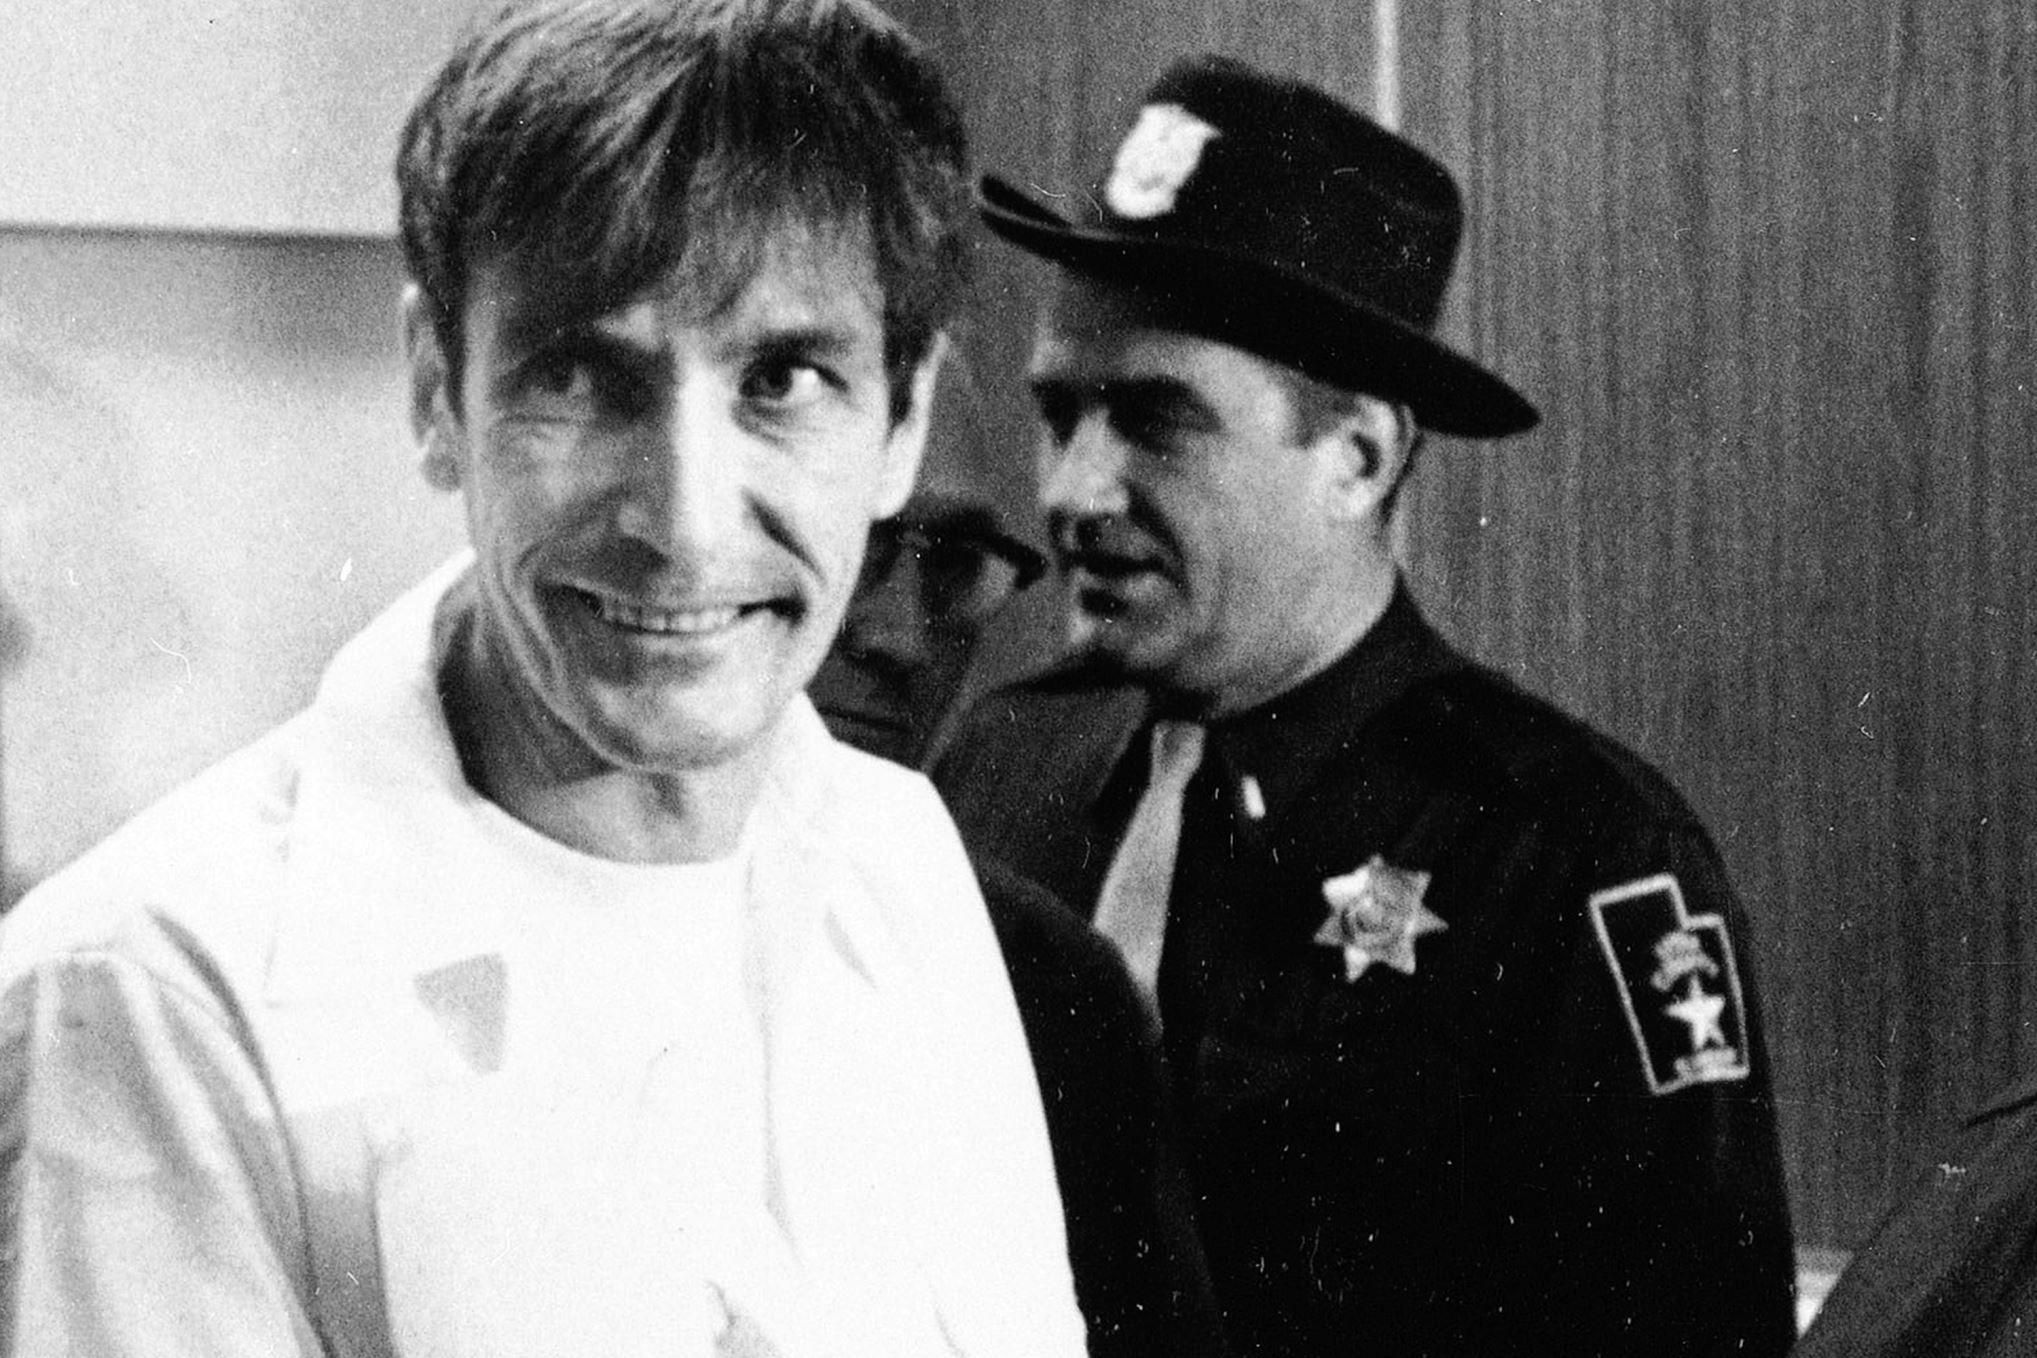 Гилмор, убийца